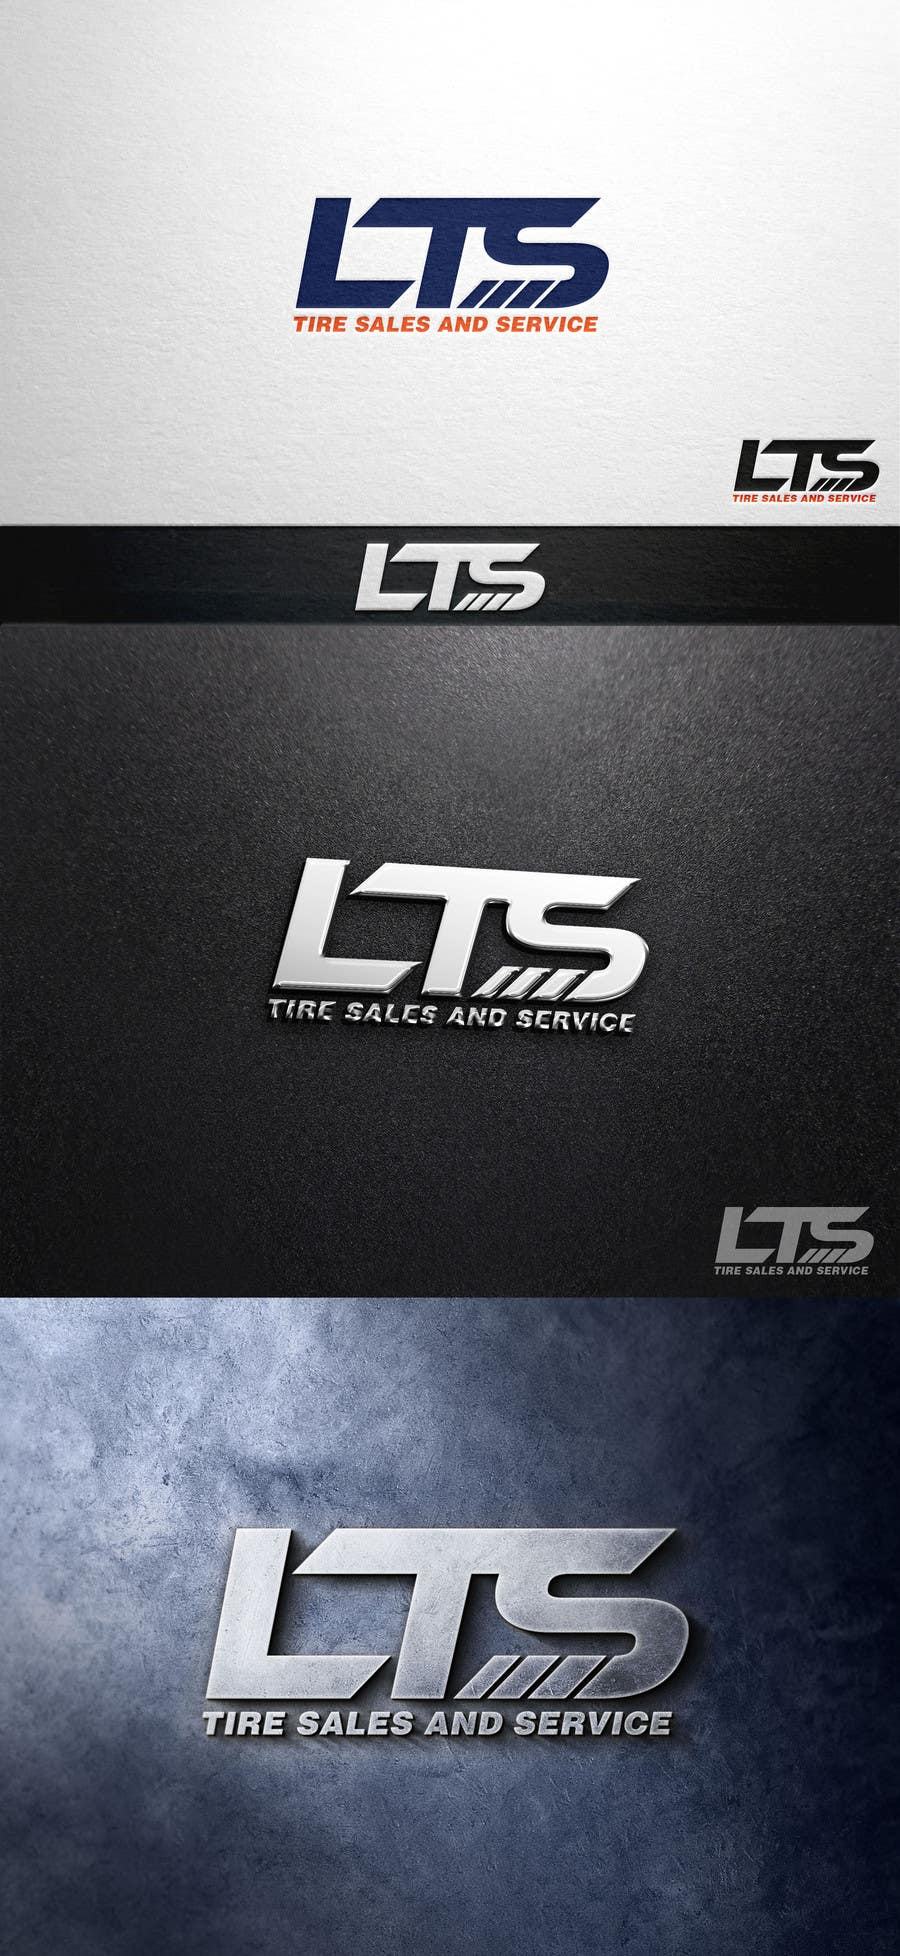 Konkurrenceindlæg #                                        77                                      for                                         Design a Logo for a Commercial Tire Service Company